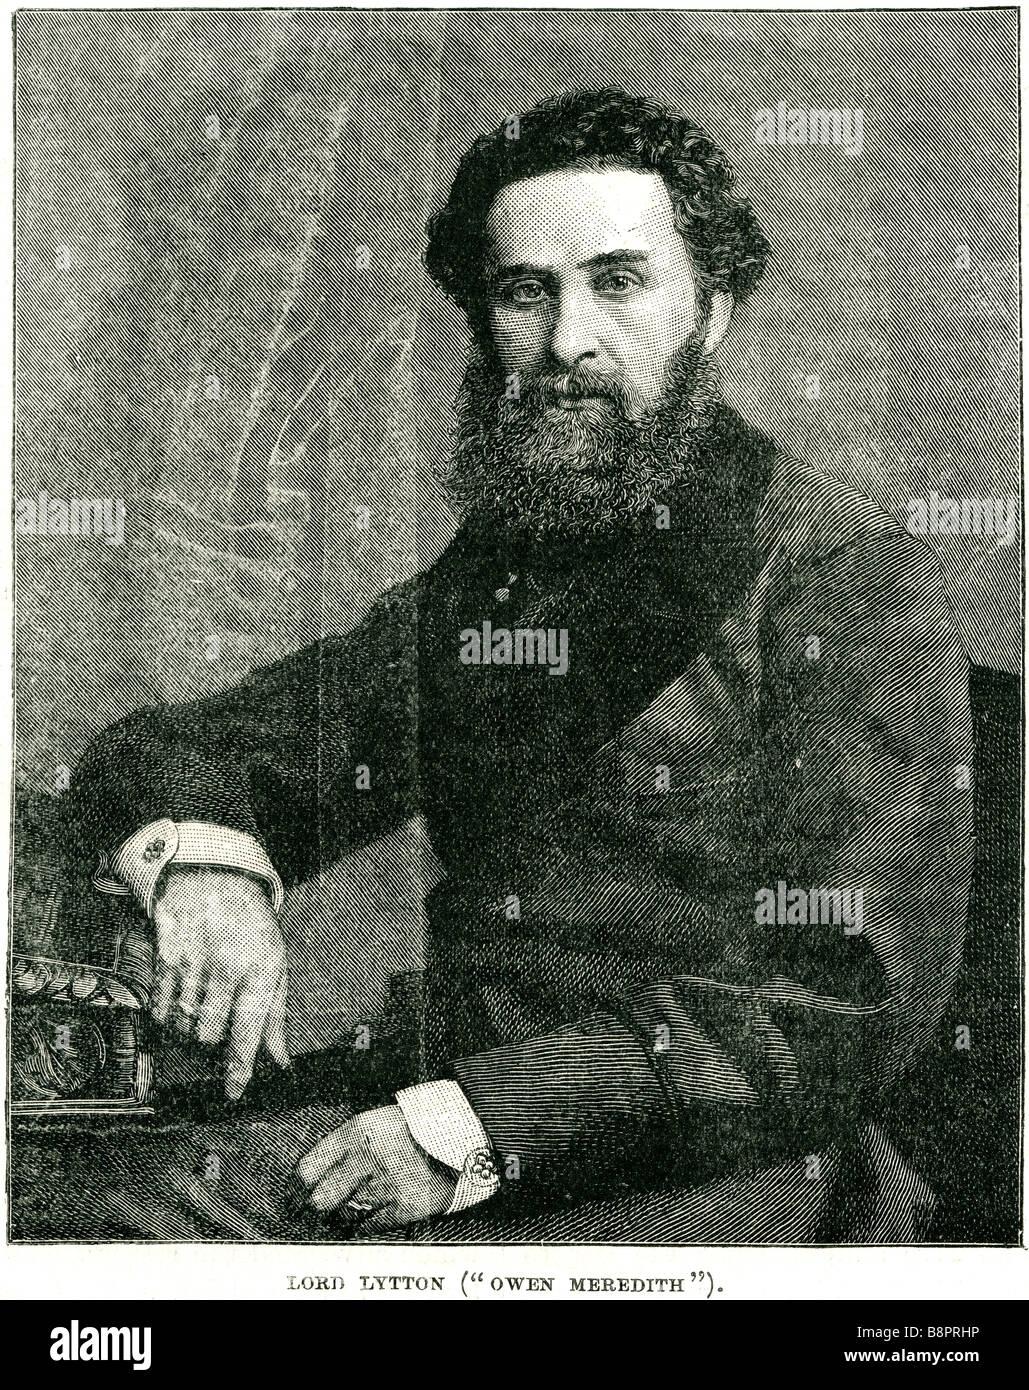 Edward George Earle Lytton Bulwer 1803 1873 English novelist poet playwright politician Stock Photo